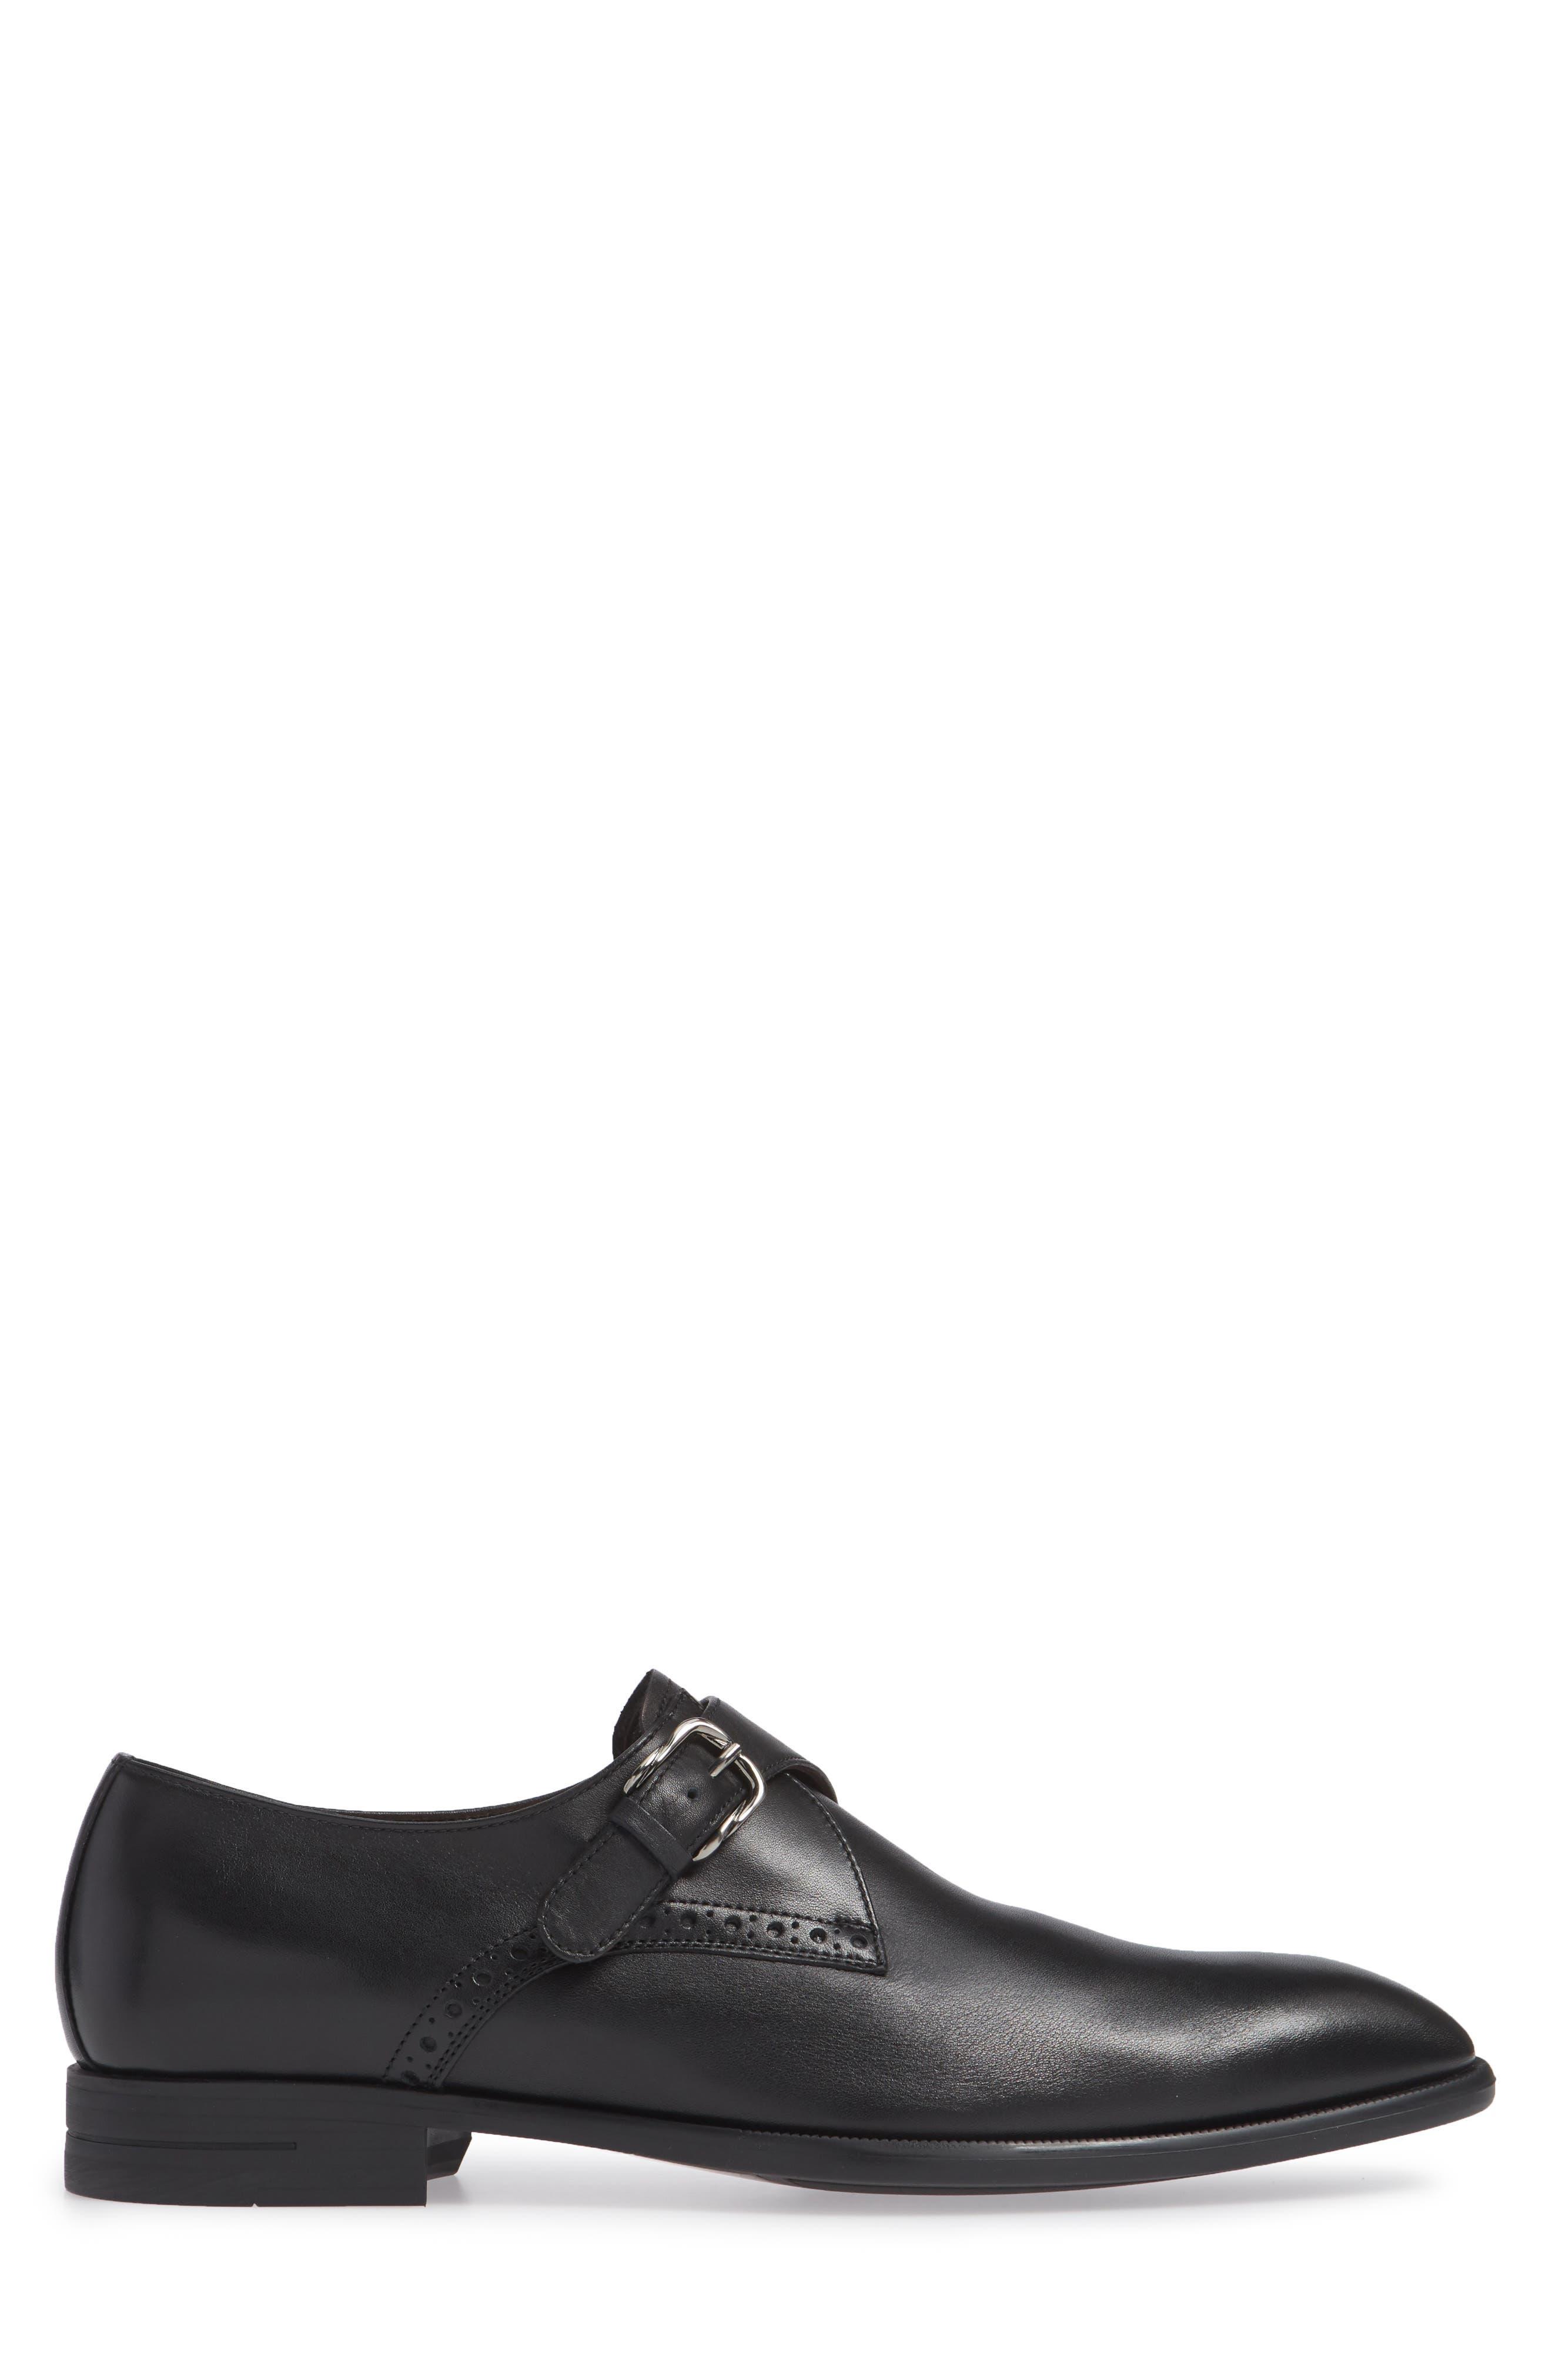 ERMENEGILDO ZEGNA, Single Strap Monk Shoe, Alternate thumbnail 3, color, BLACK